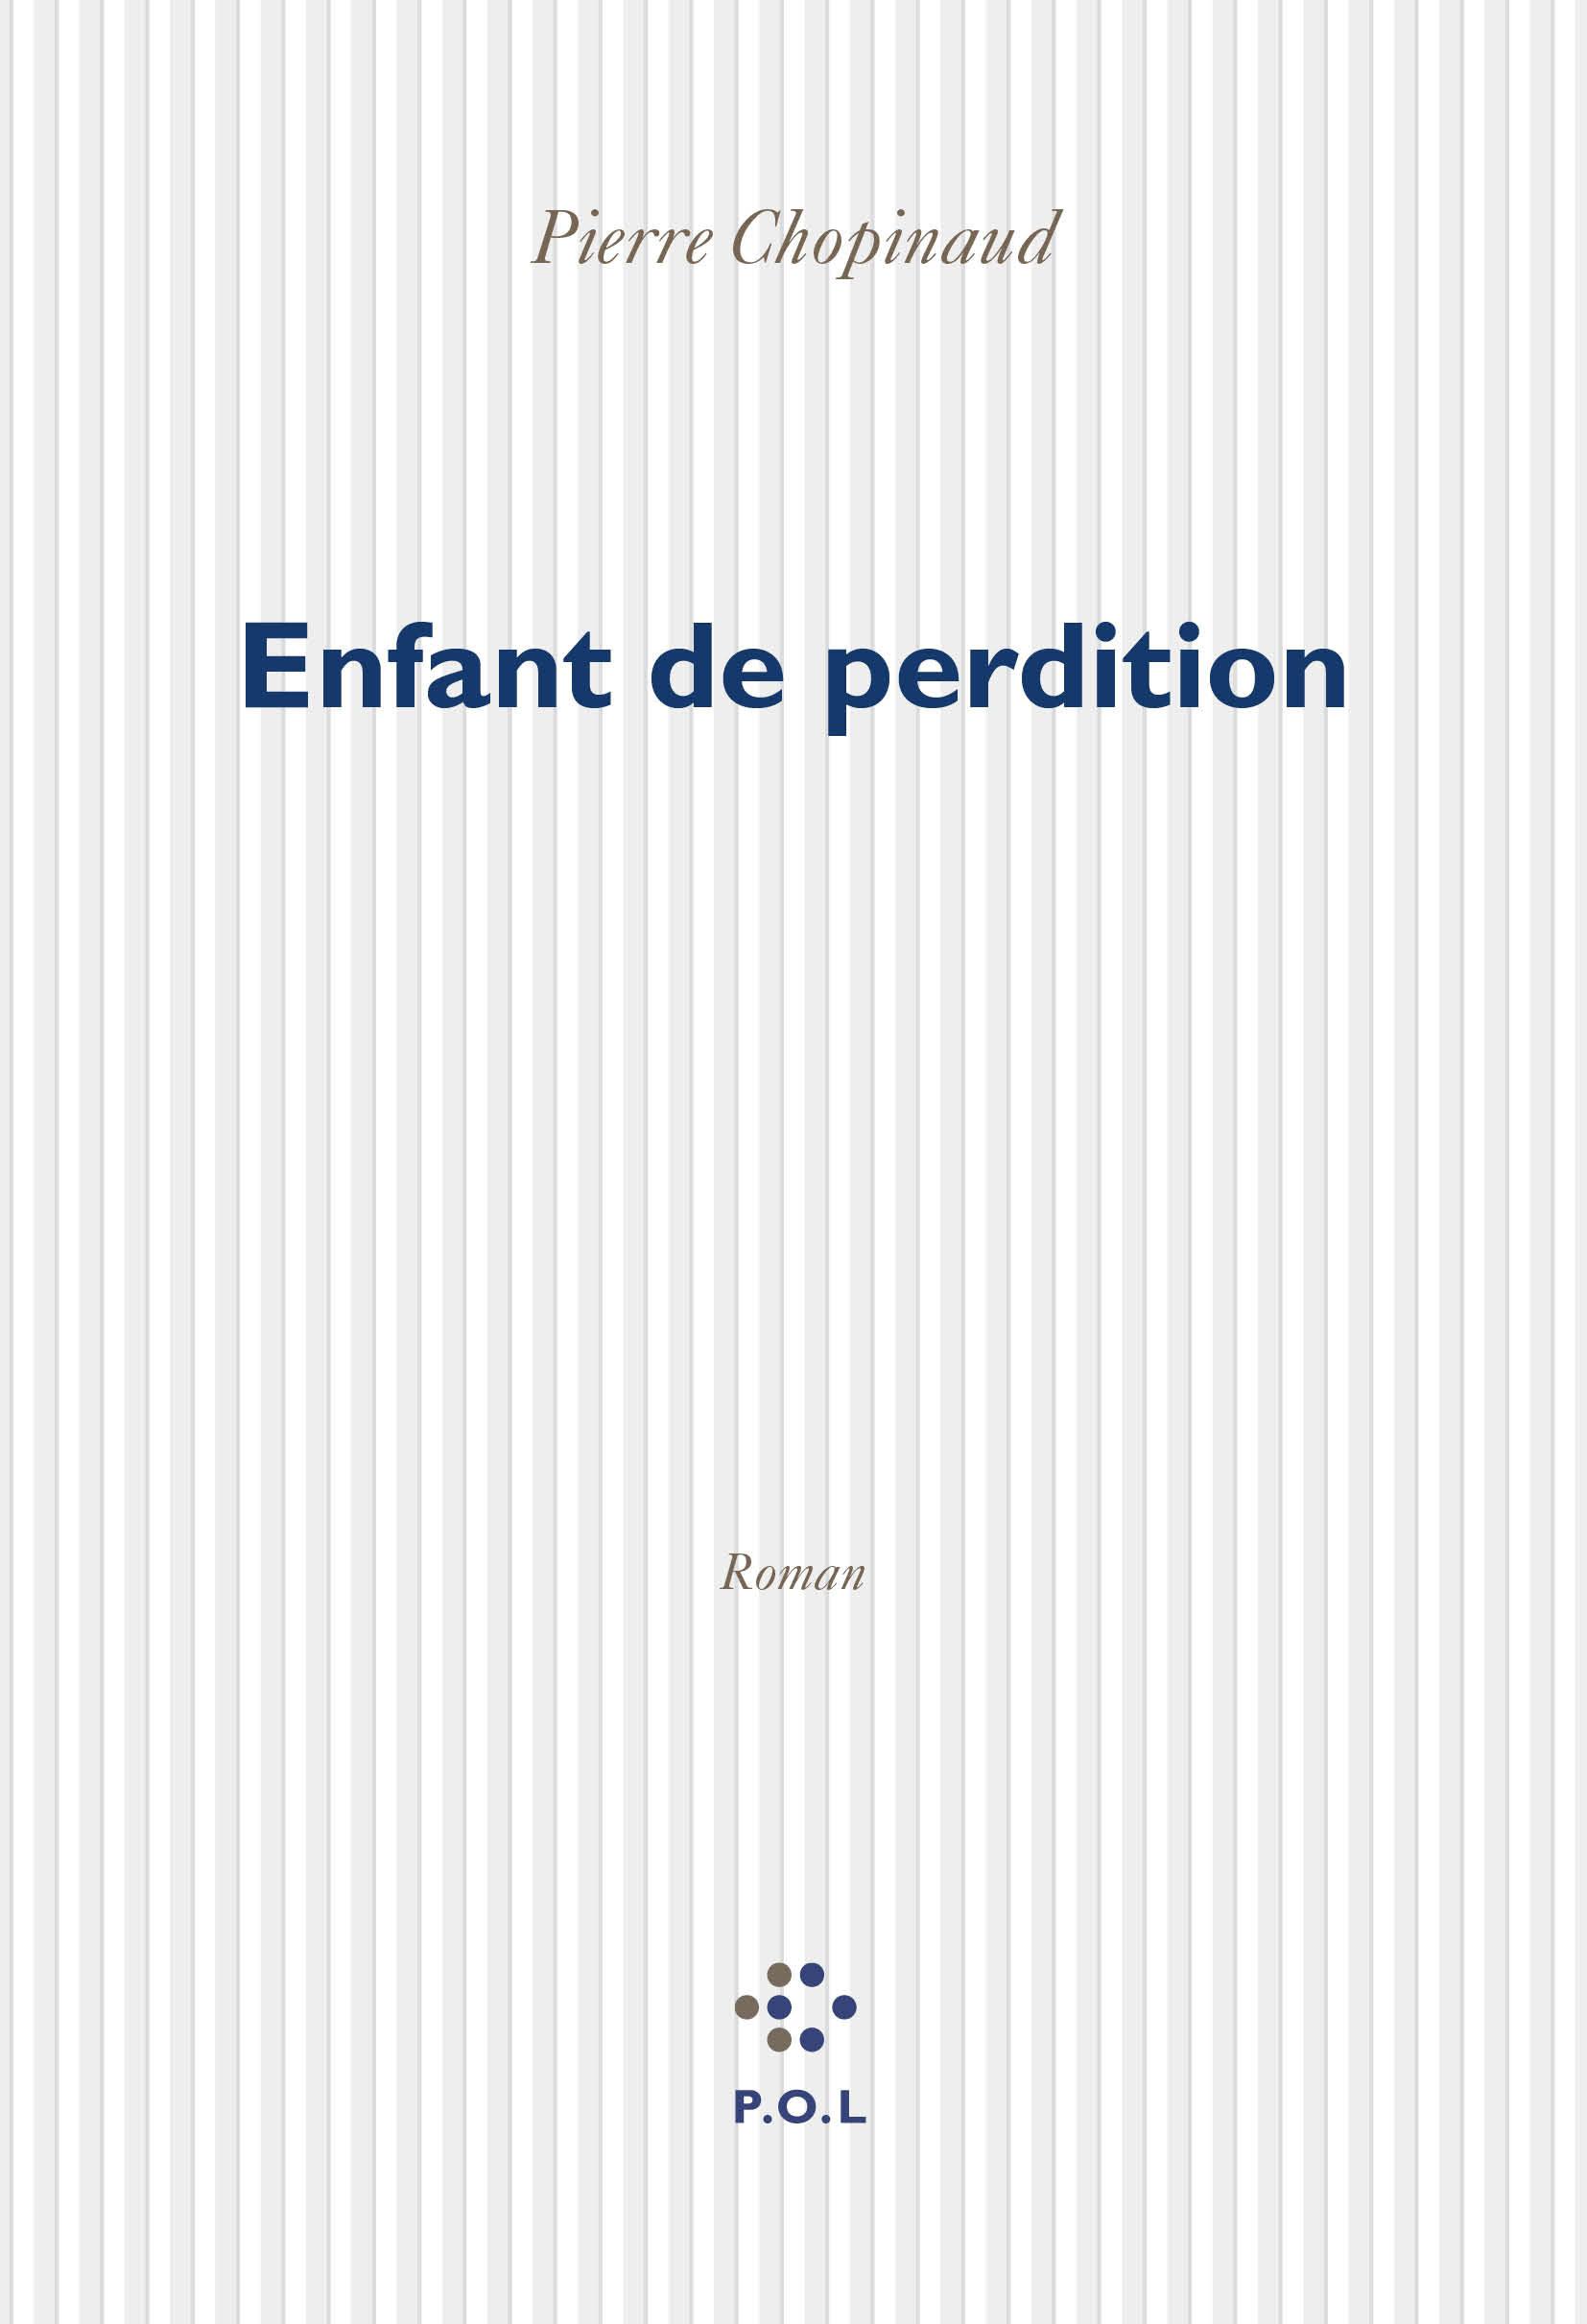 ENFANT DE PERDITION